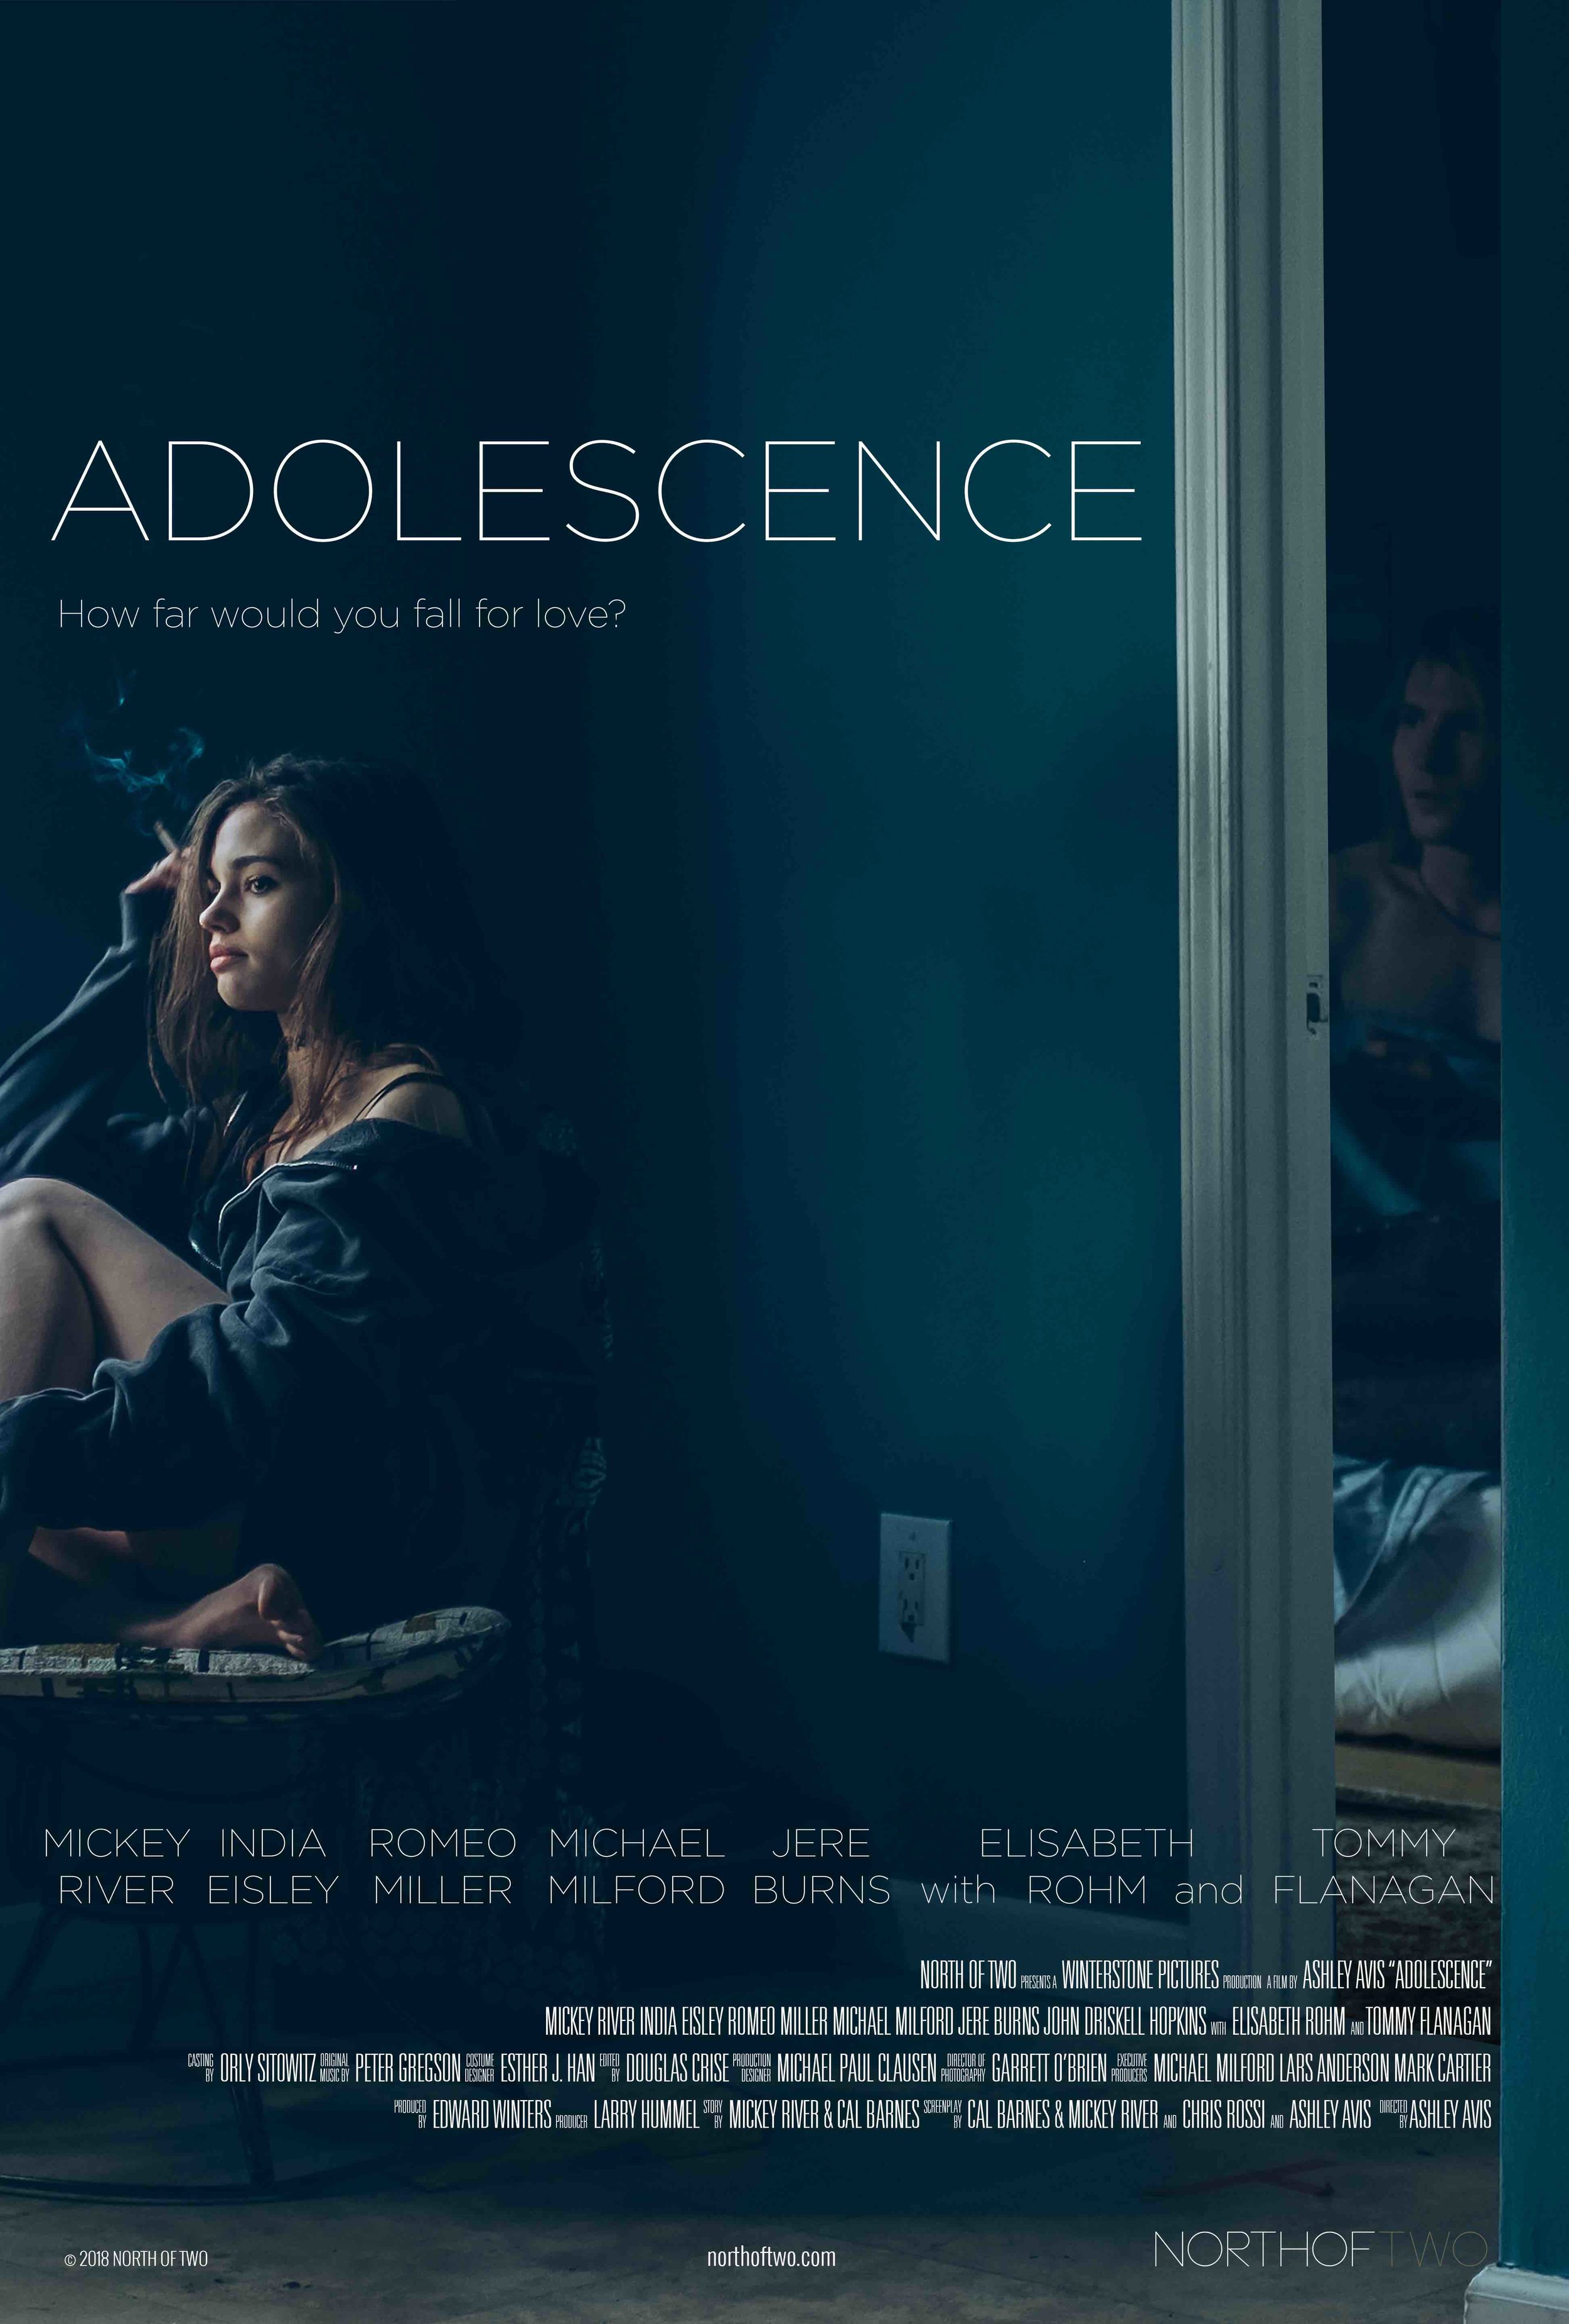 AdolescencePOSTER_WEB.jpg